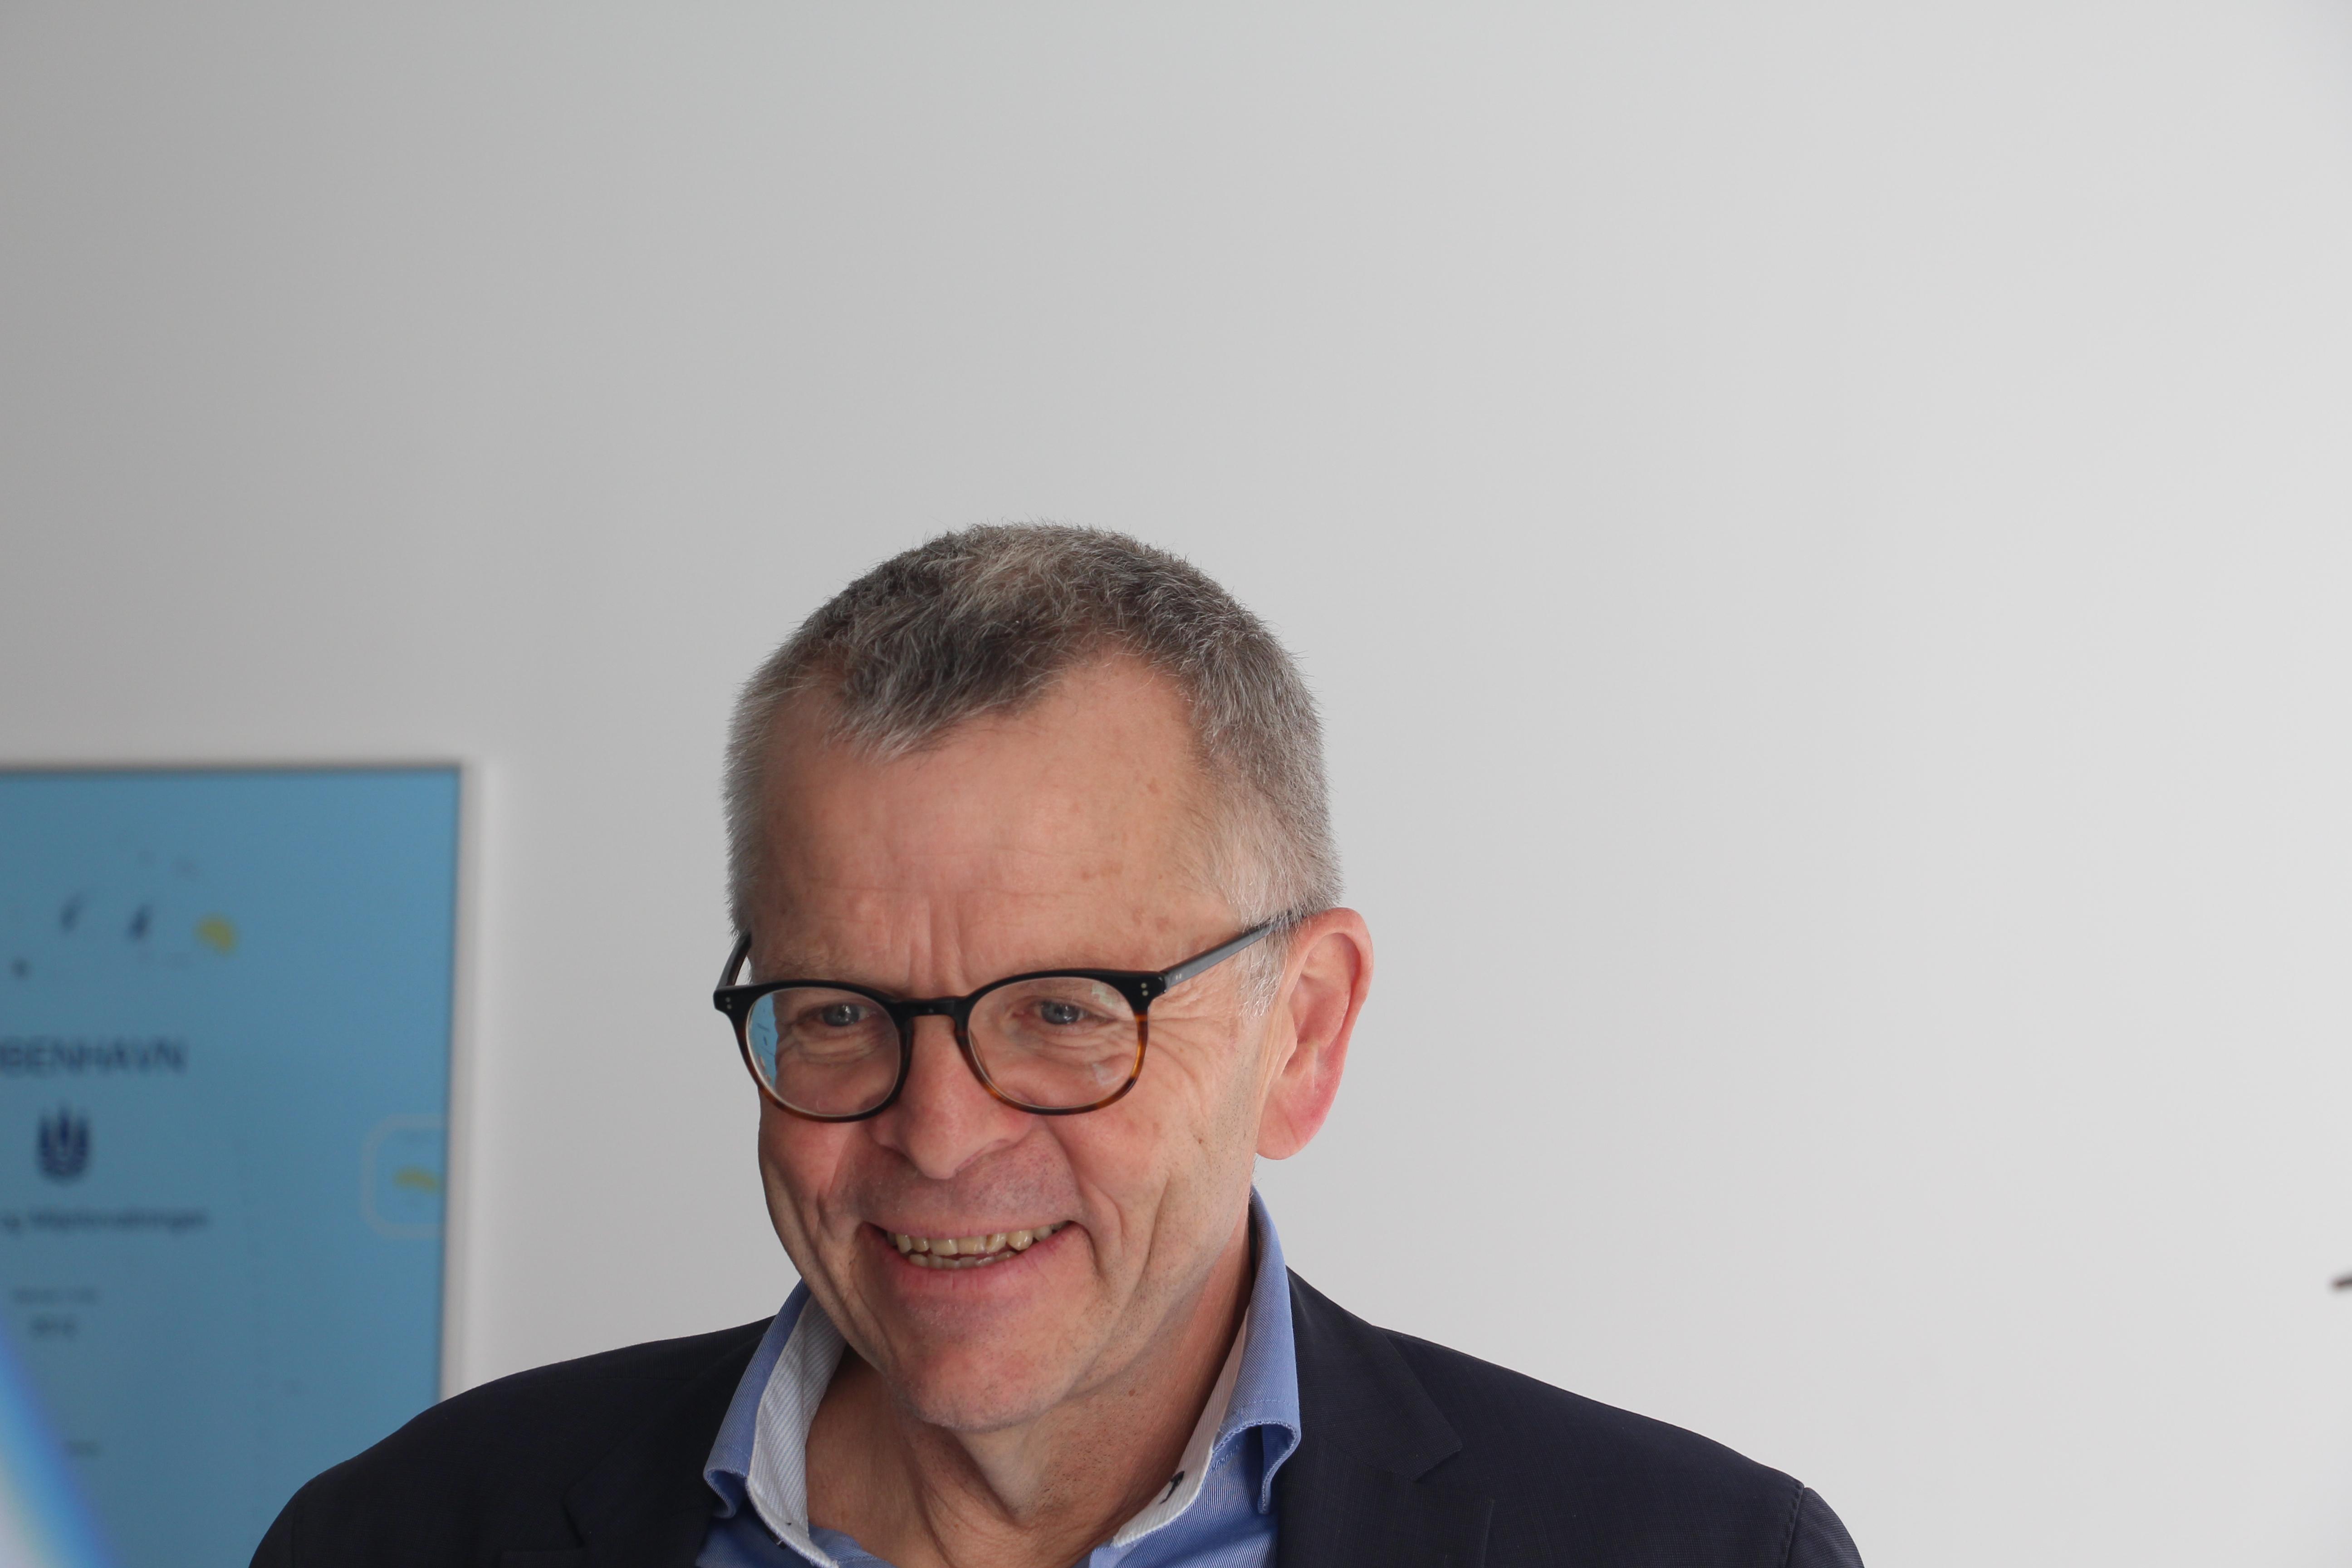 Interview with Steffen Rasmussen, City of Copenhagen